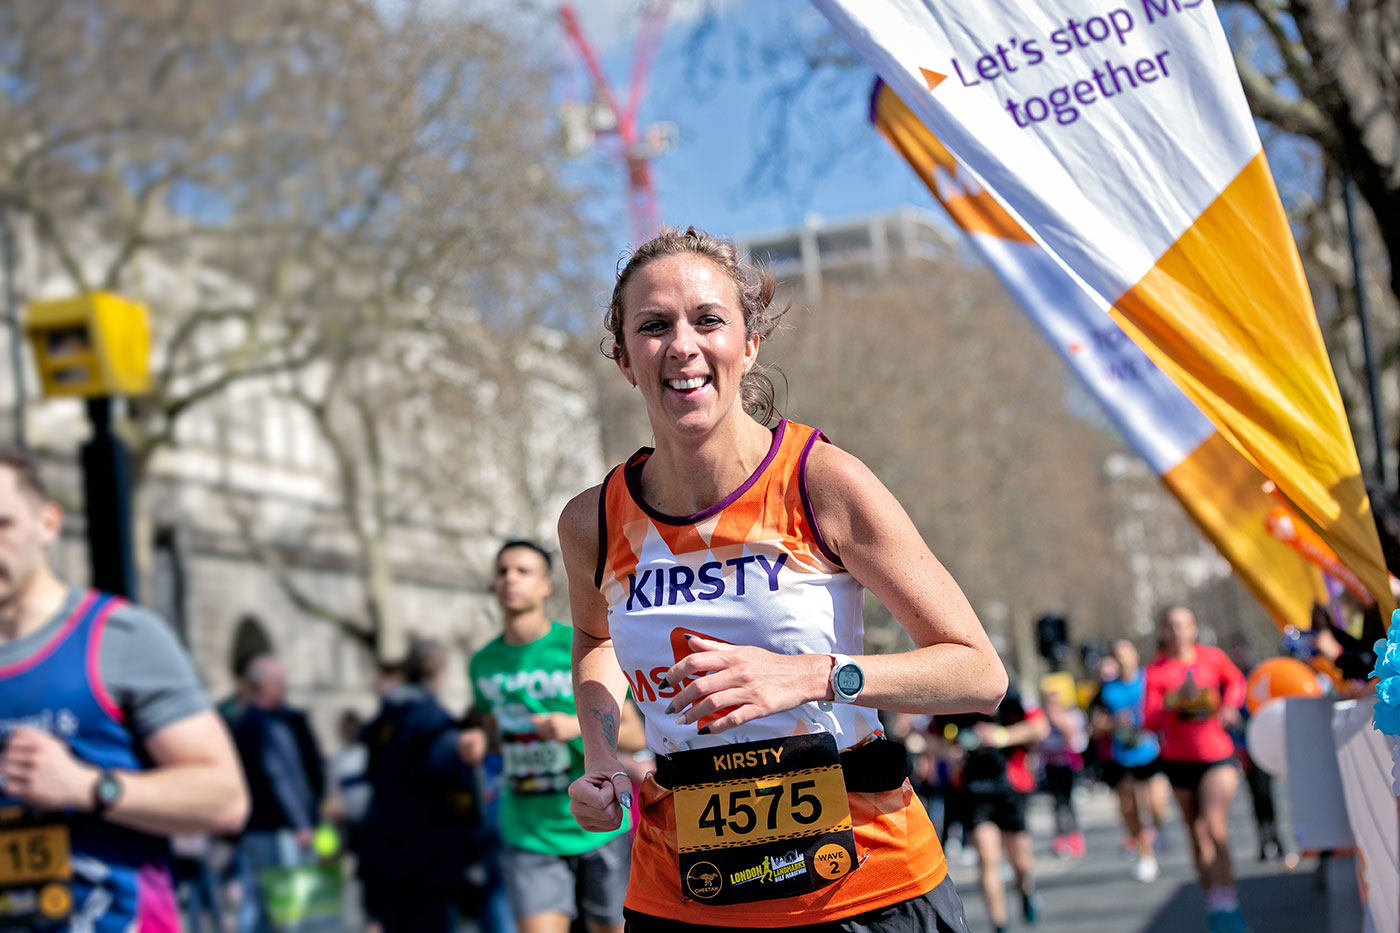 London Landmarks Half Marathon with the MS Society